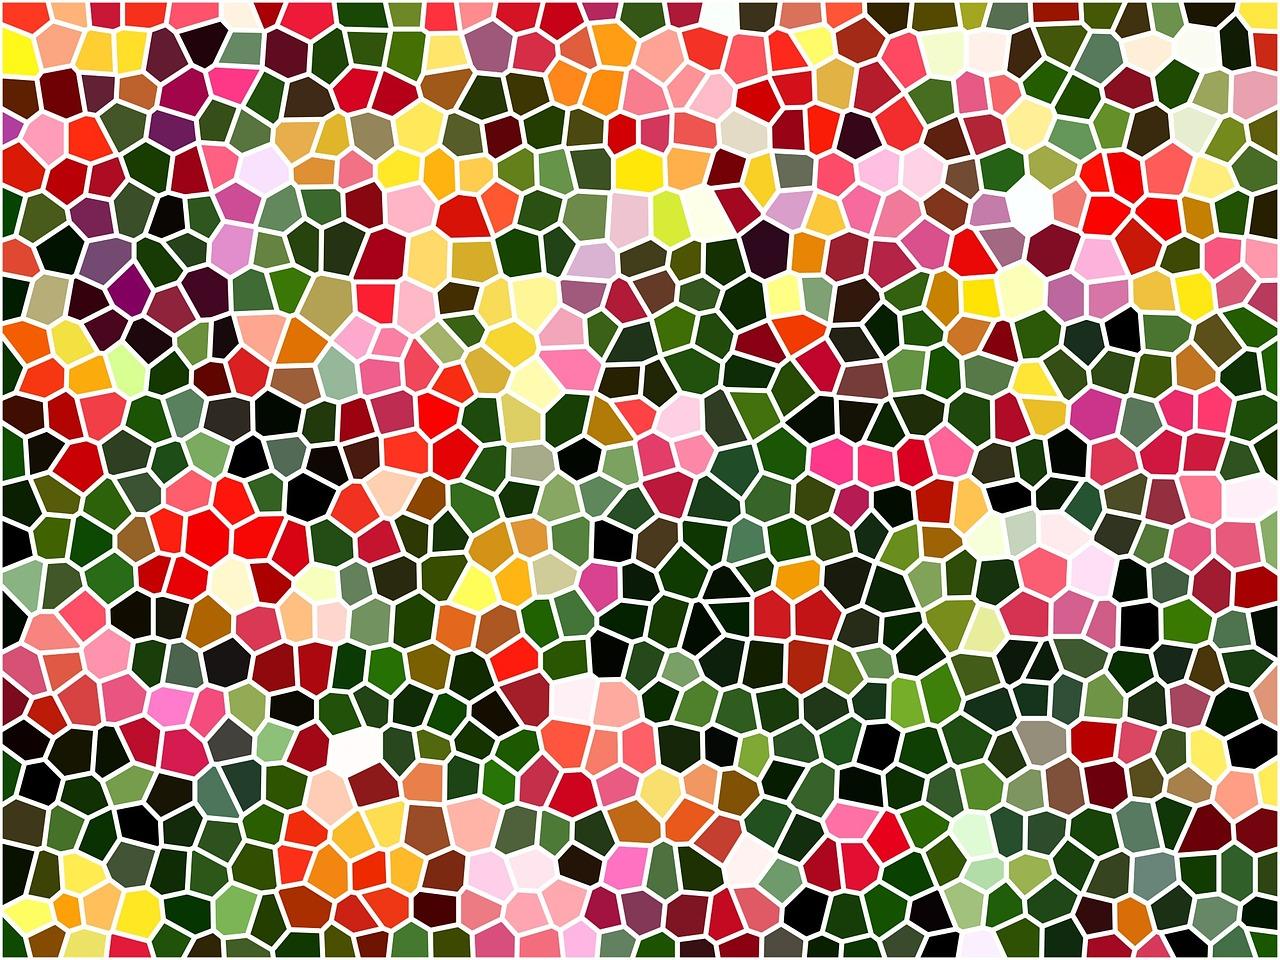 Картинка с мозаикой, хорошим